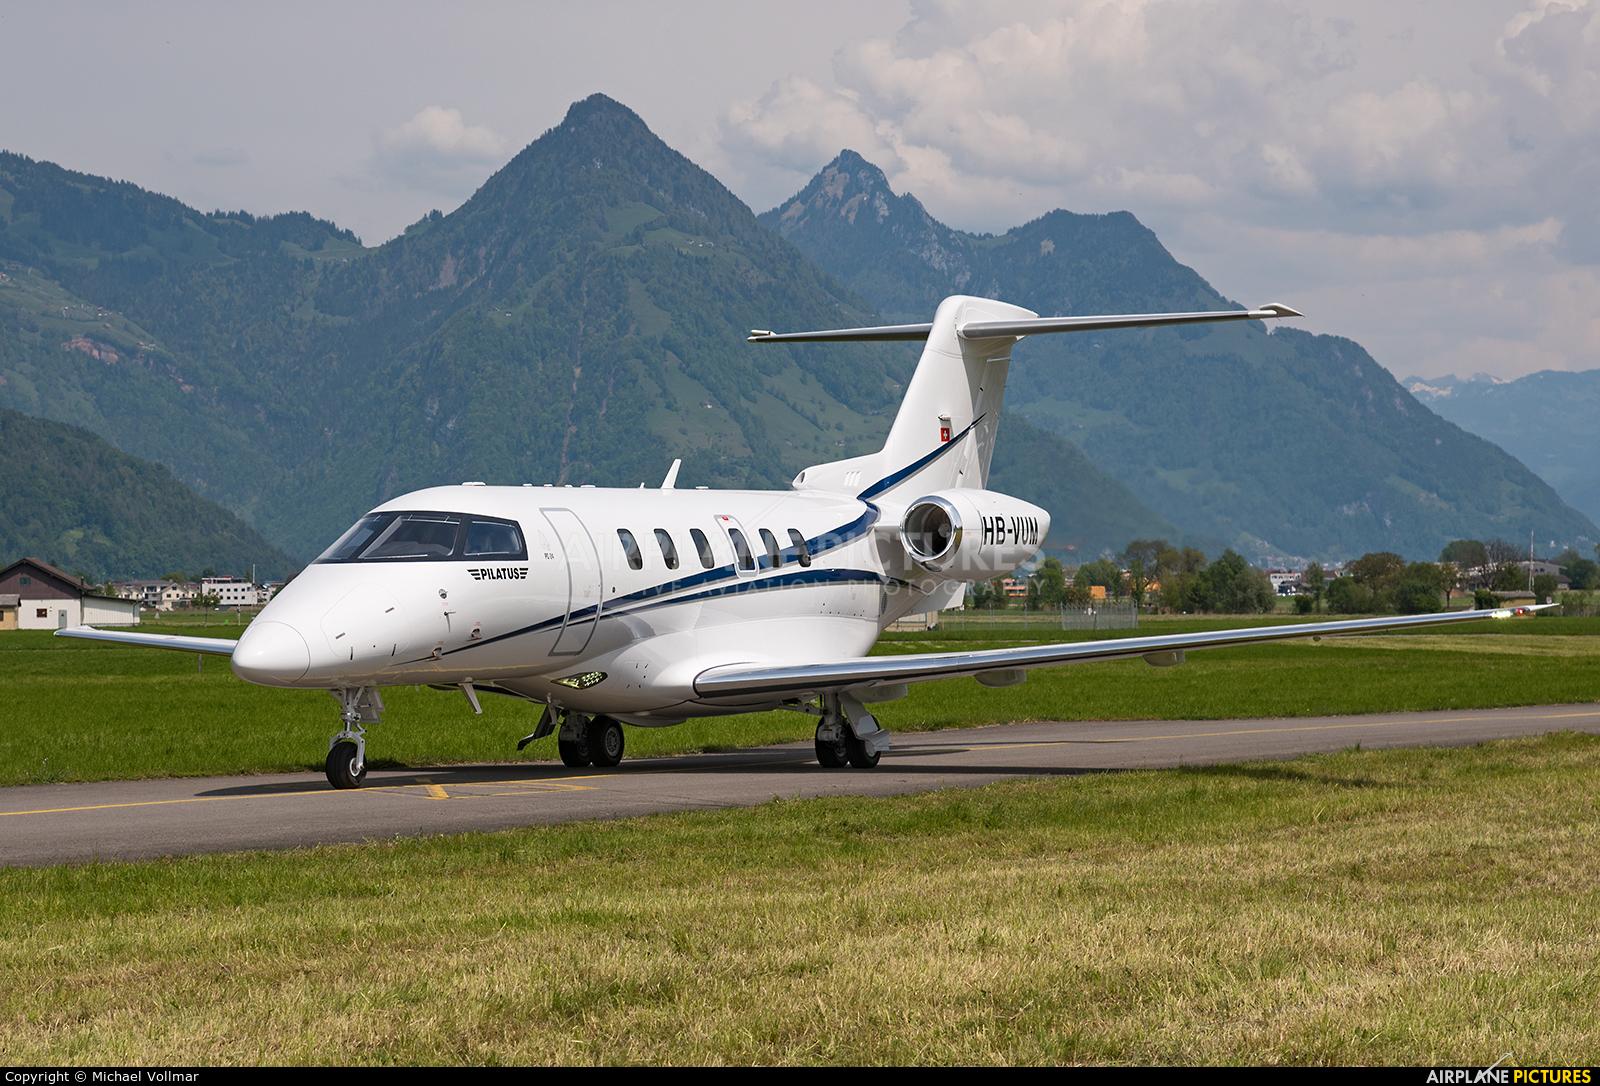 Pilatus HB-VUM aircraft at Buochs